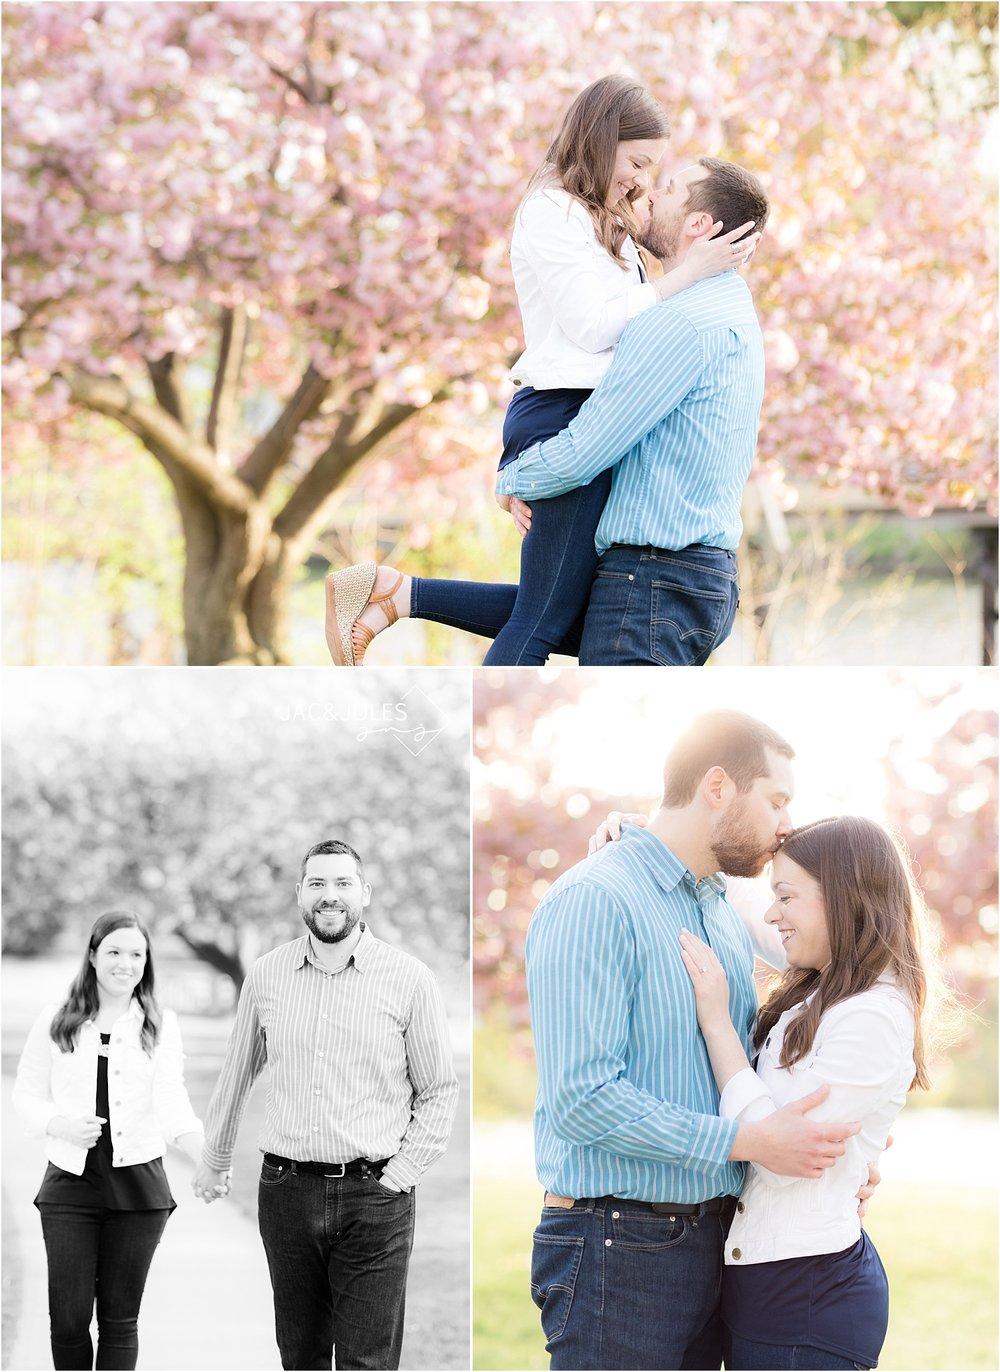 romantic engagement photo in divine park spring lake nj